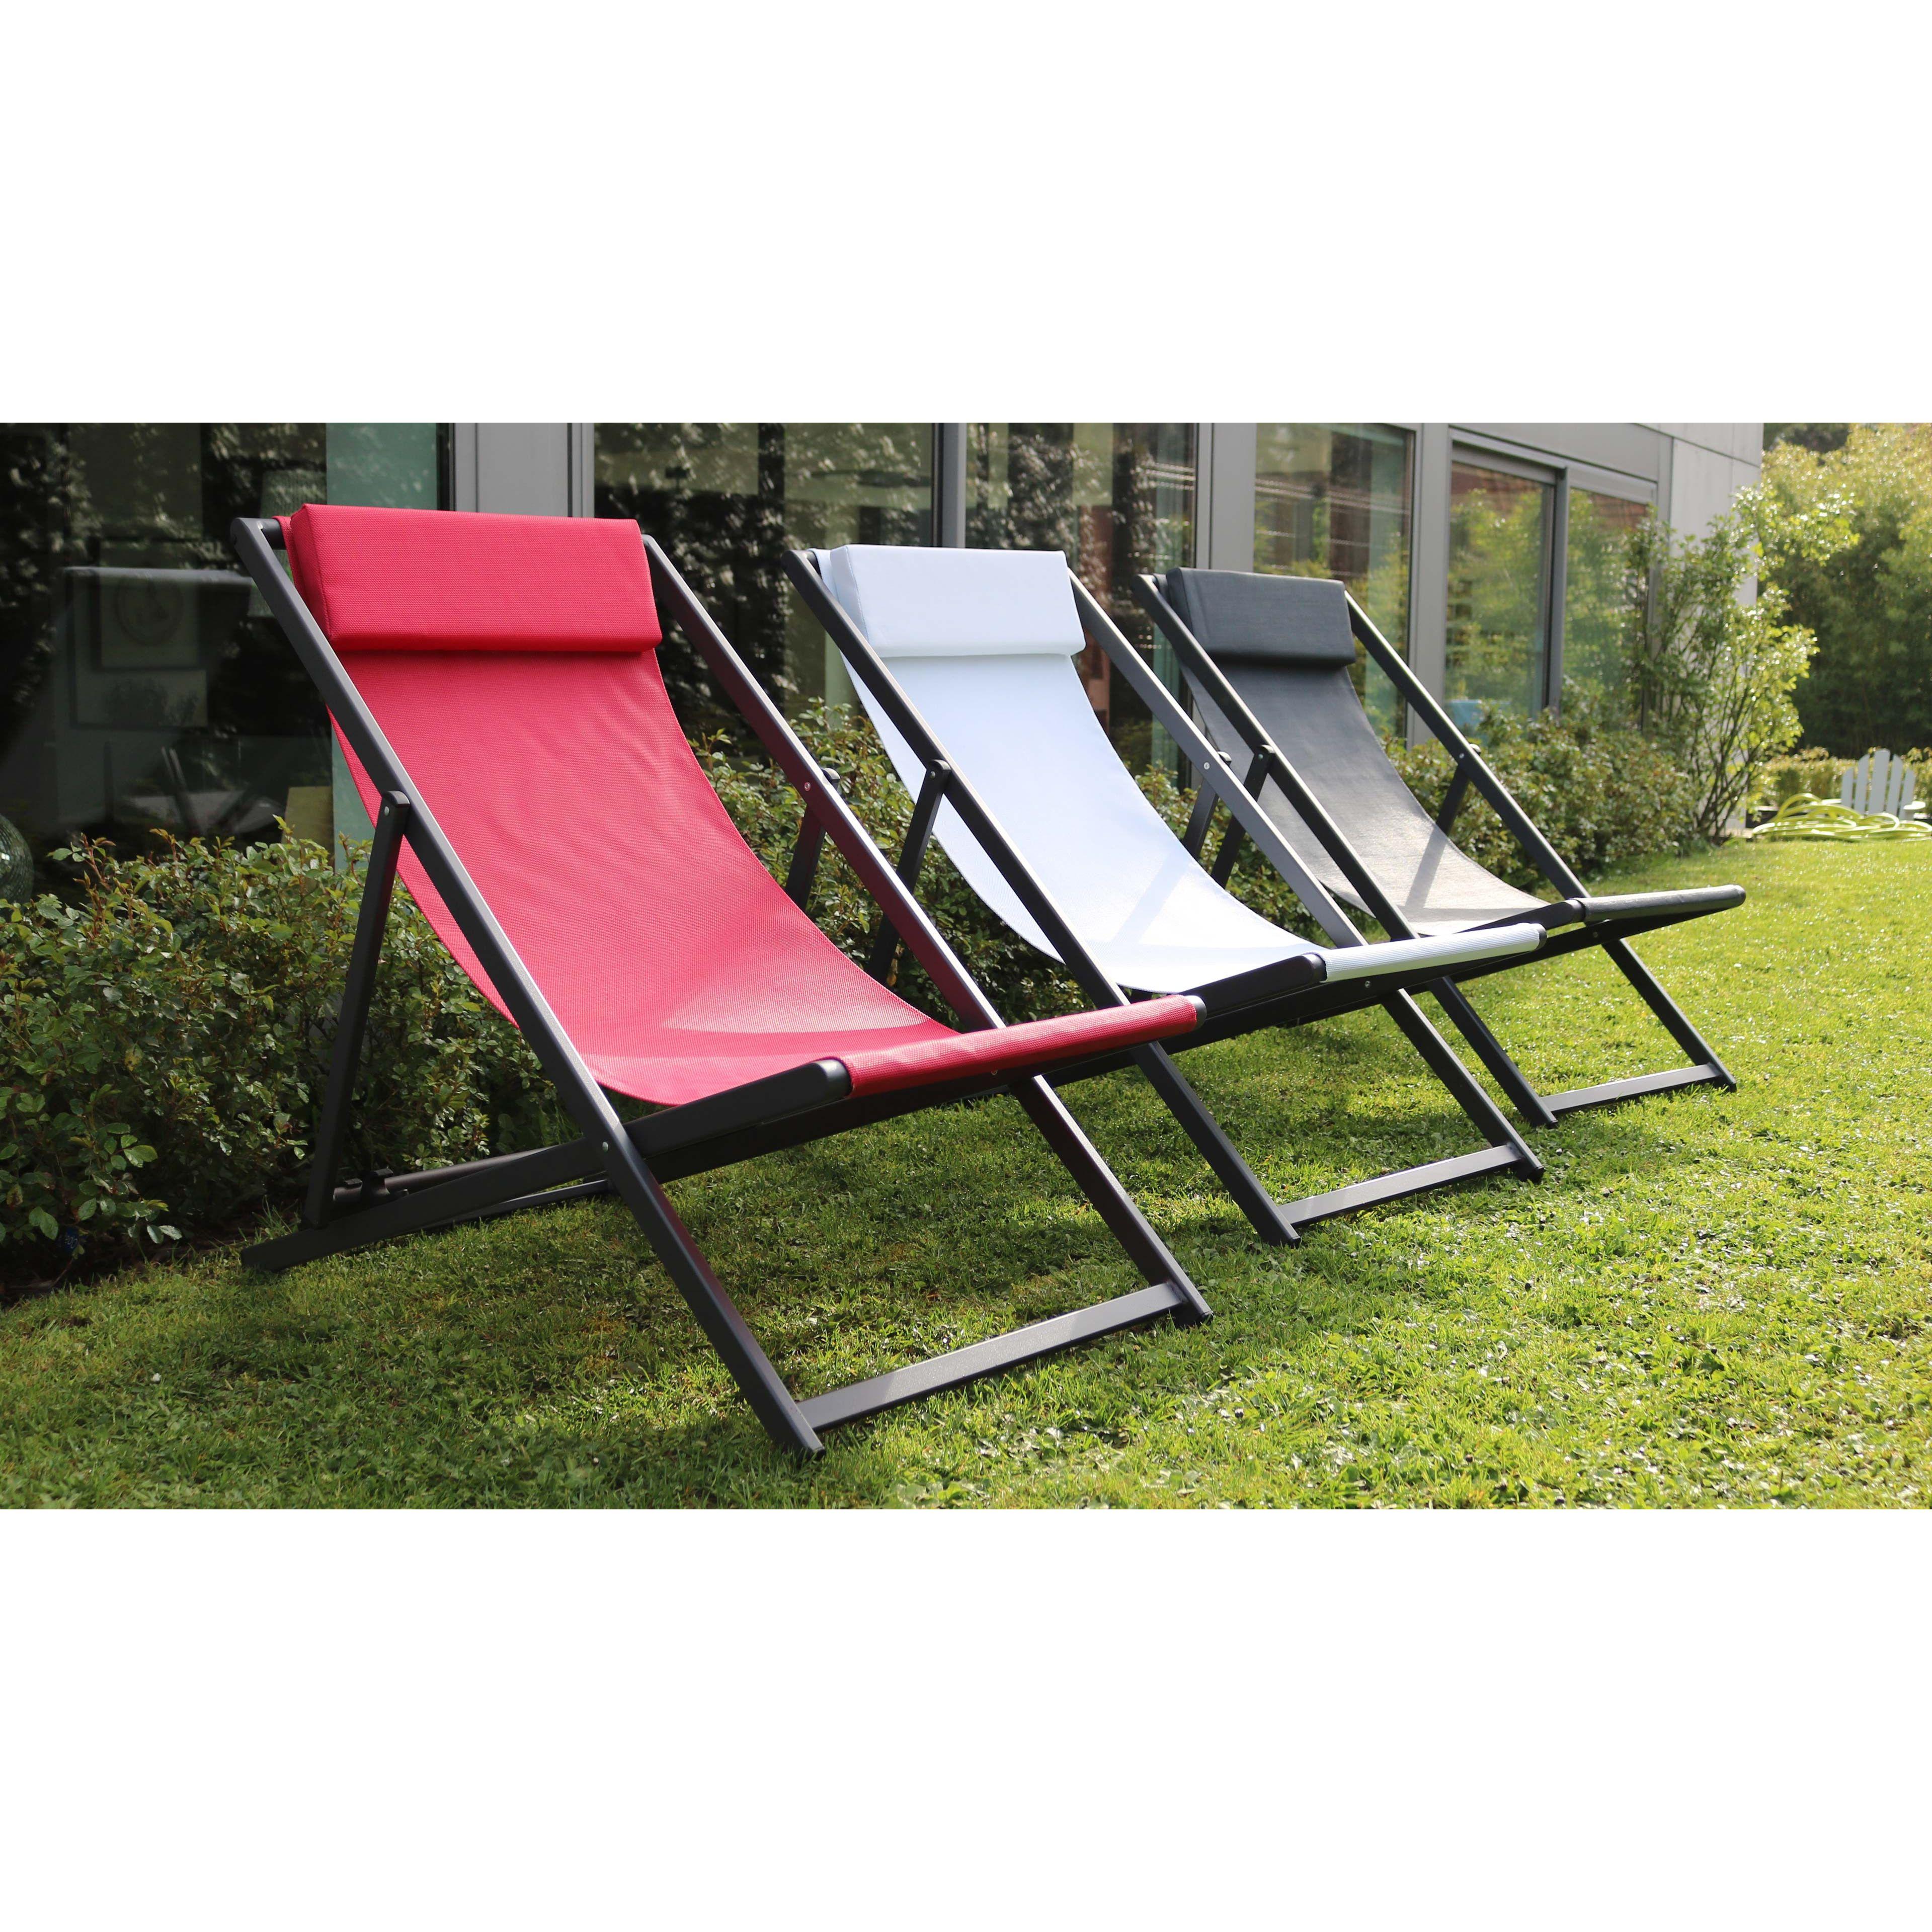 chilienne aluminium pliante. Black Bedroom Furniture Sets. Home Design Ideas